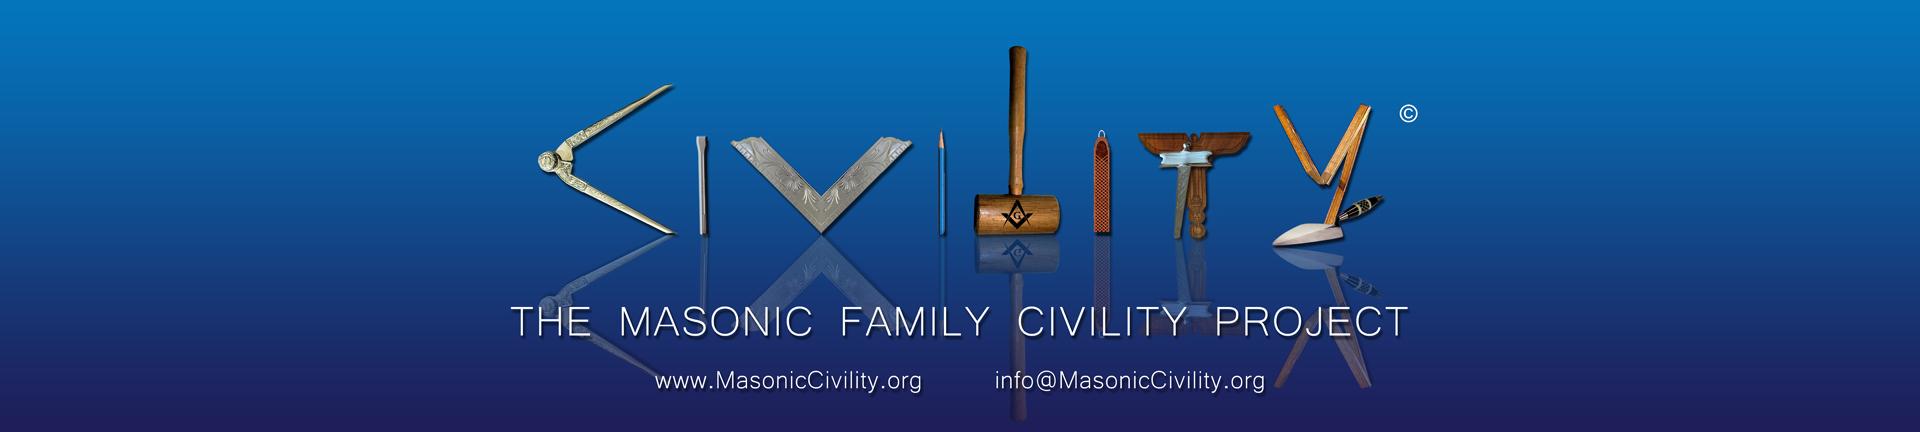 Masonic Family Civility wide banner